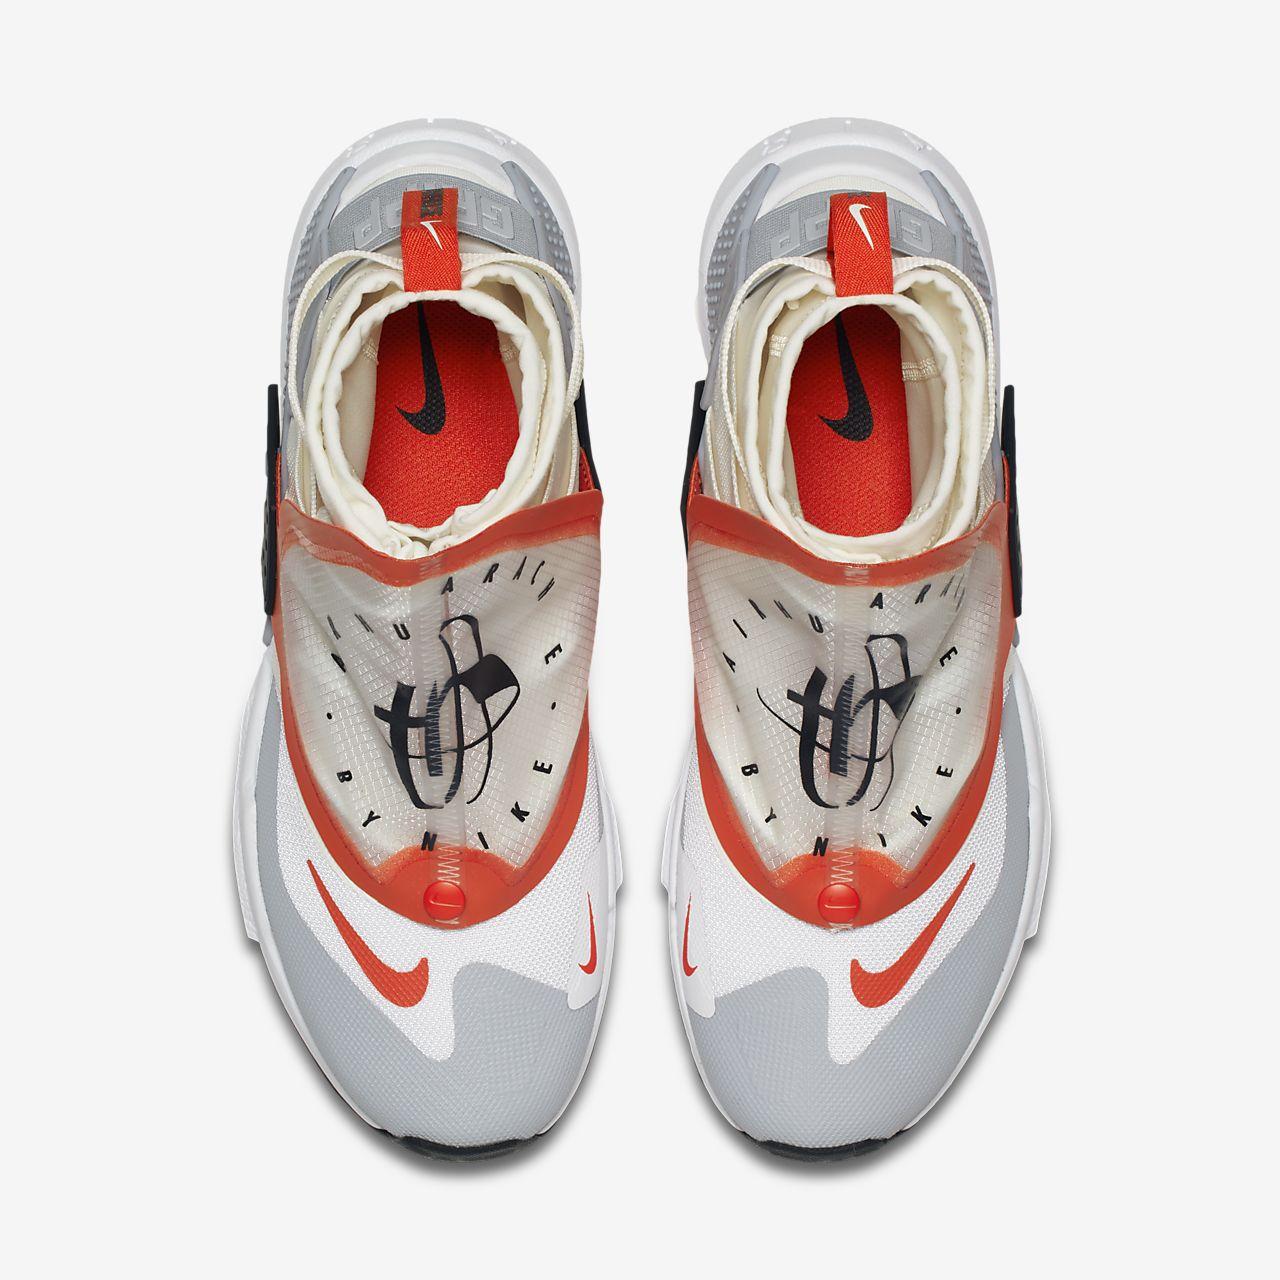 83dda7d7c829 Nike Air Huarache Gripp Men s Shoe. Nike.com